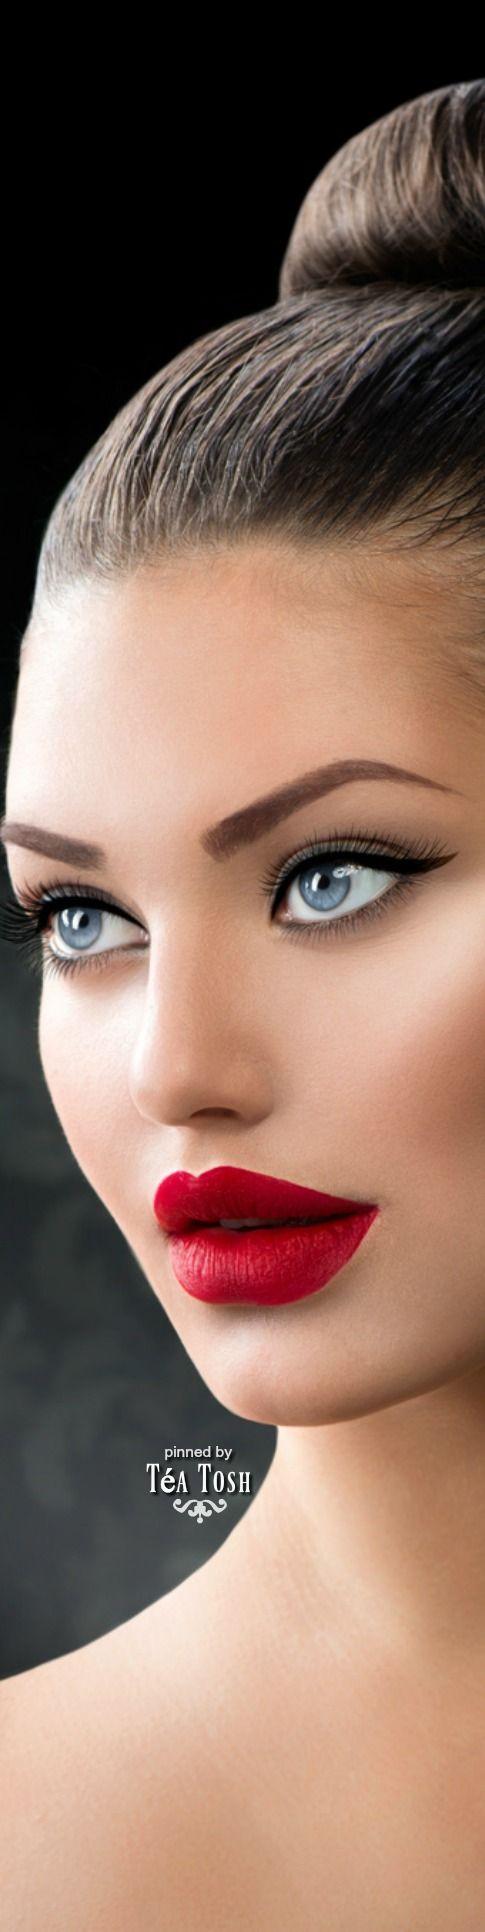 For More  Makeup Brushes    Click Here http://moneybuds.com/Makeup/